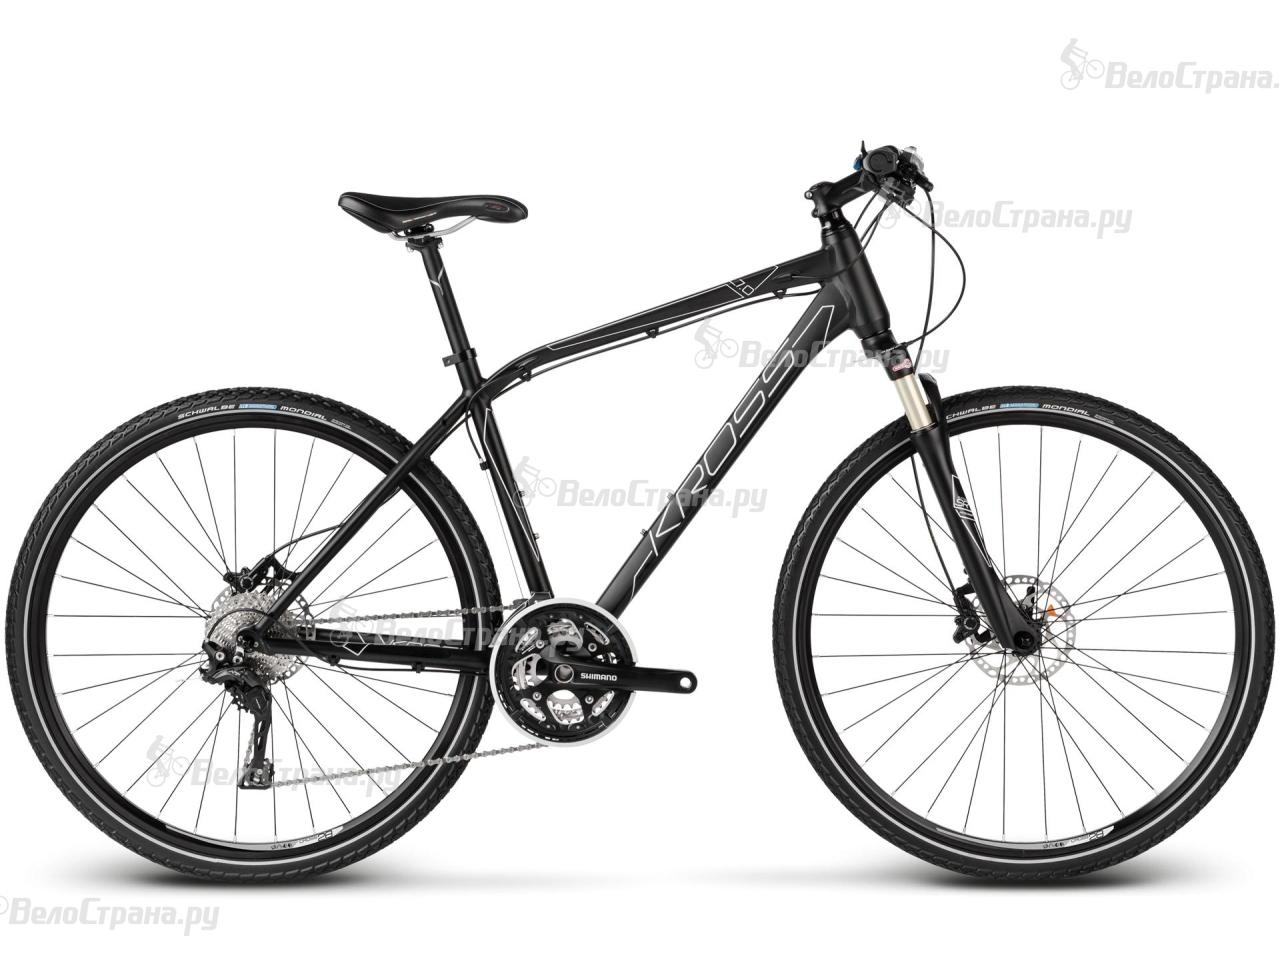 Велосипед Kross Evado 7.0 (2017) велосипед kross evado 1 0 lady 2017